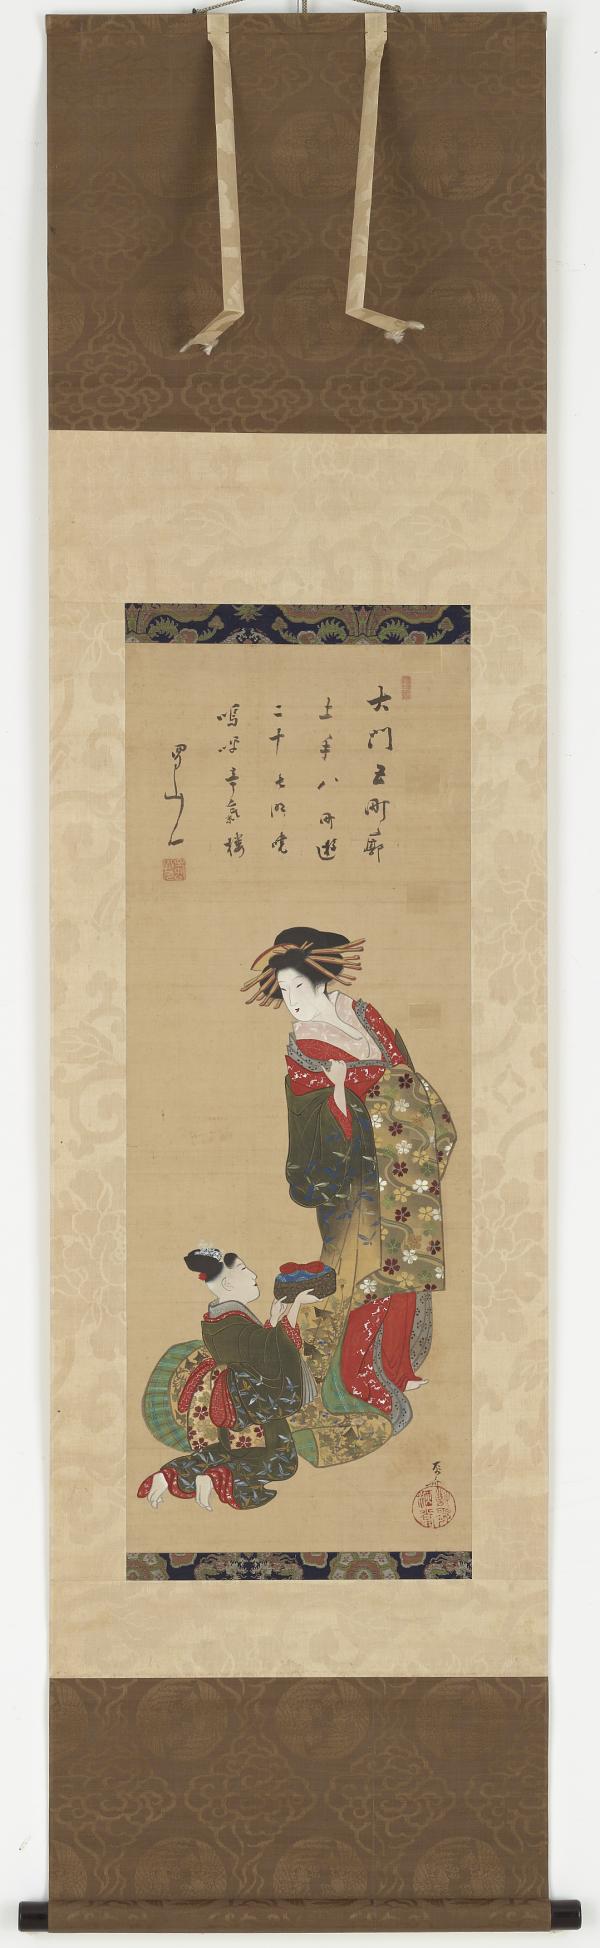 An Oiran being served by her kamuro  TYPE Hanging scroll MAKER(S) Artist: Ryūryūkyo Shinsai 柳々居辰斎 (Ukiyoe school, ca. 1764 - 1820)